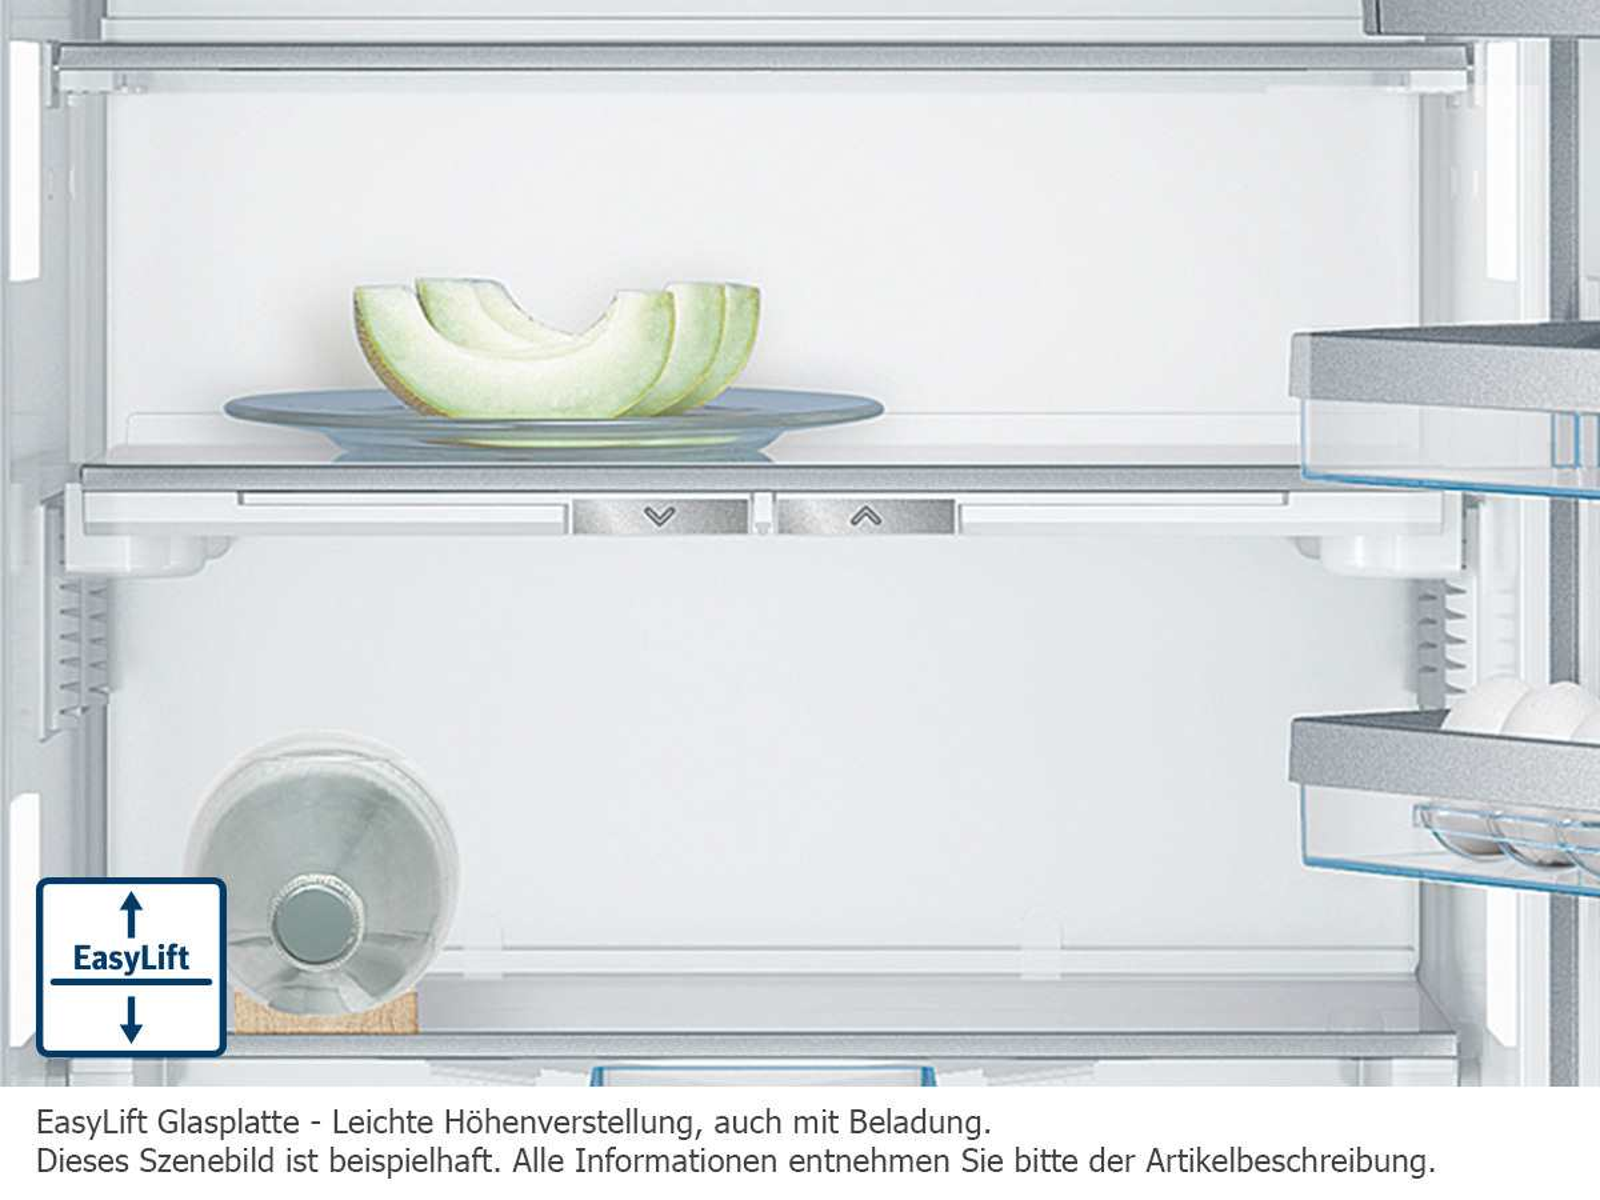 Bosch KAD99PI30 Side by Side Kühl-Gefrier-Kombination Edelstahl Anti-Fingerprint